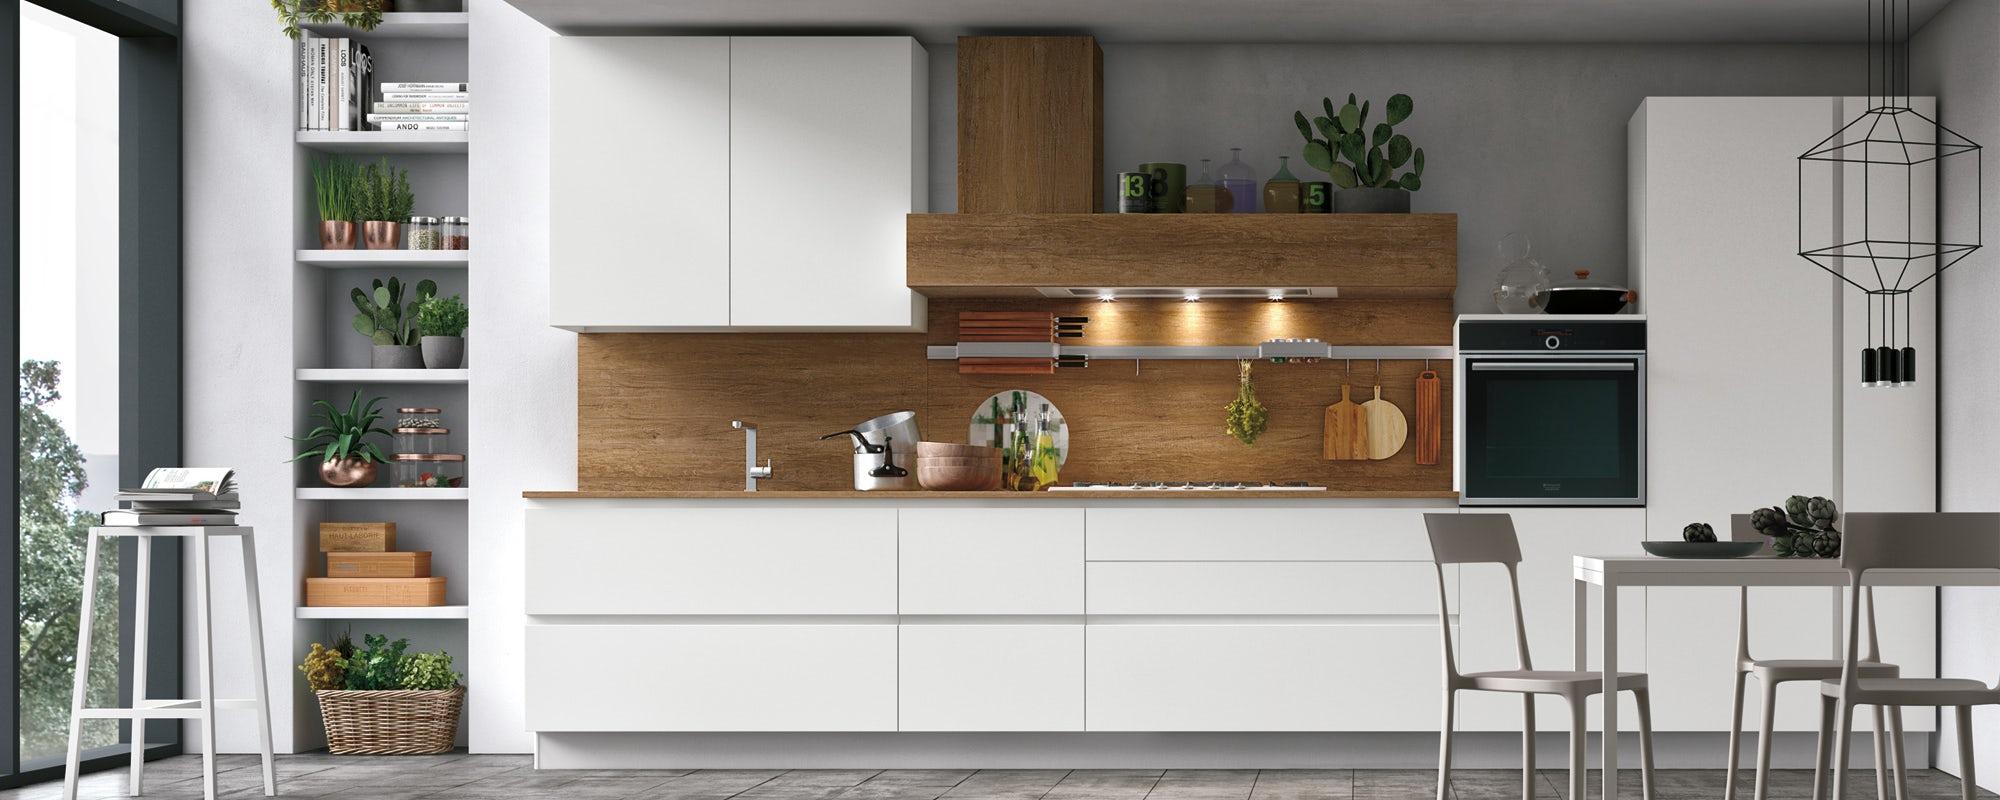 stosa-cucine-moderne-infinity-231jpg